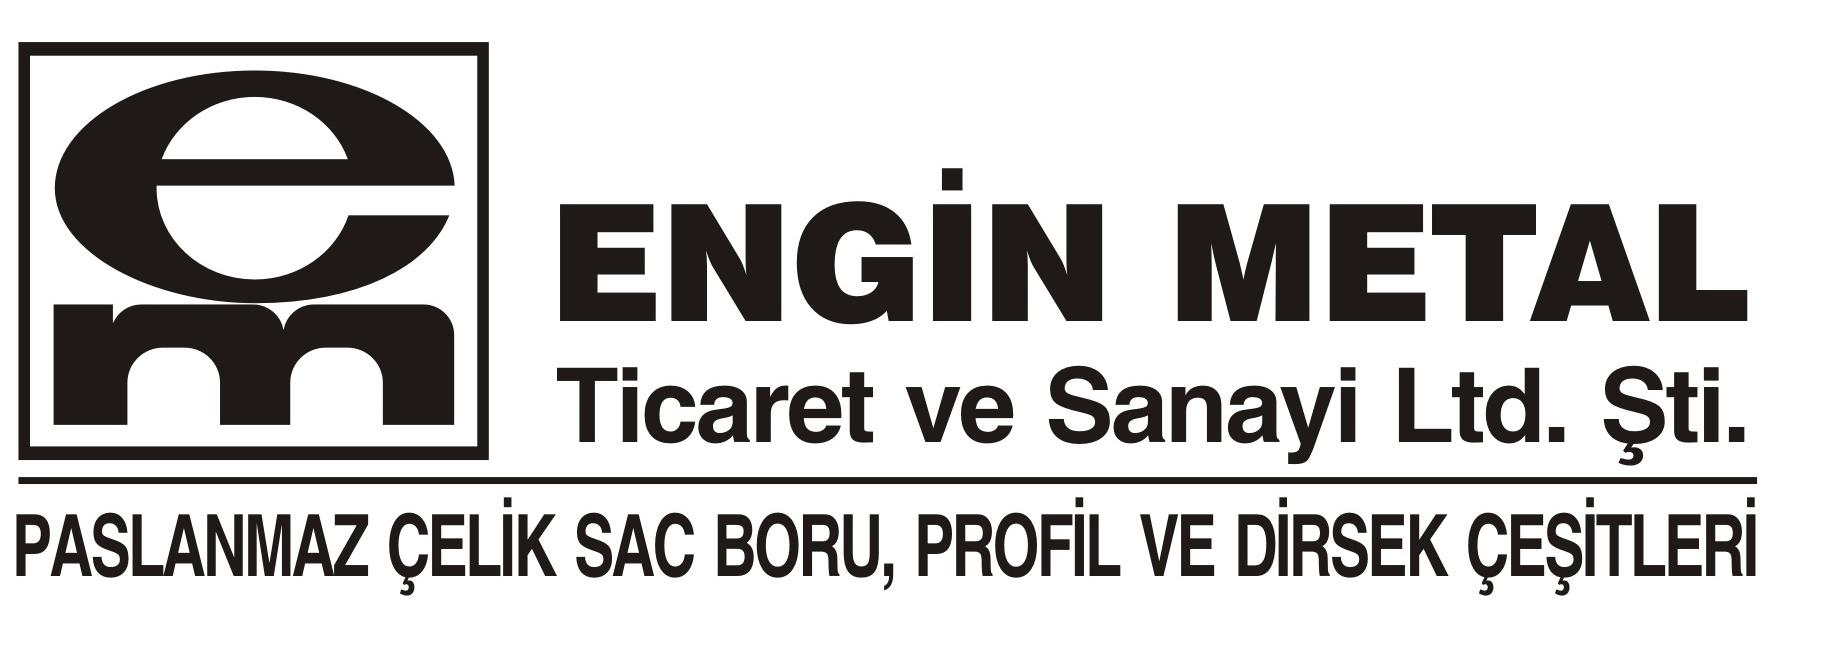 Engin Metal Tic. ve San. Ltd. Şti.